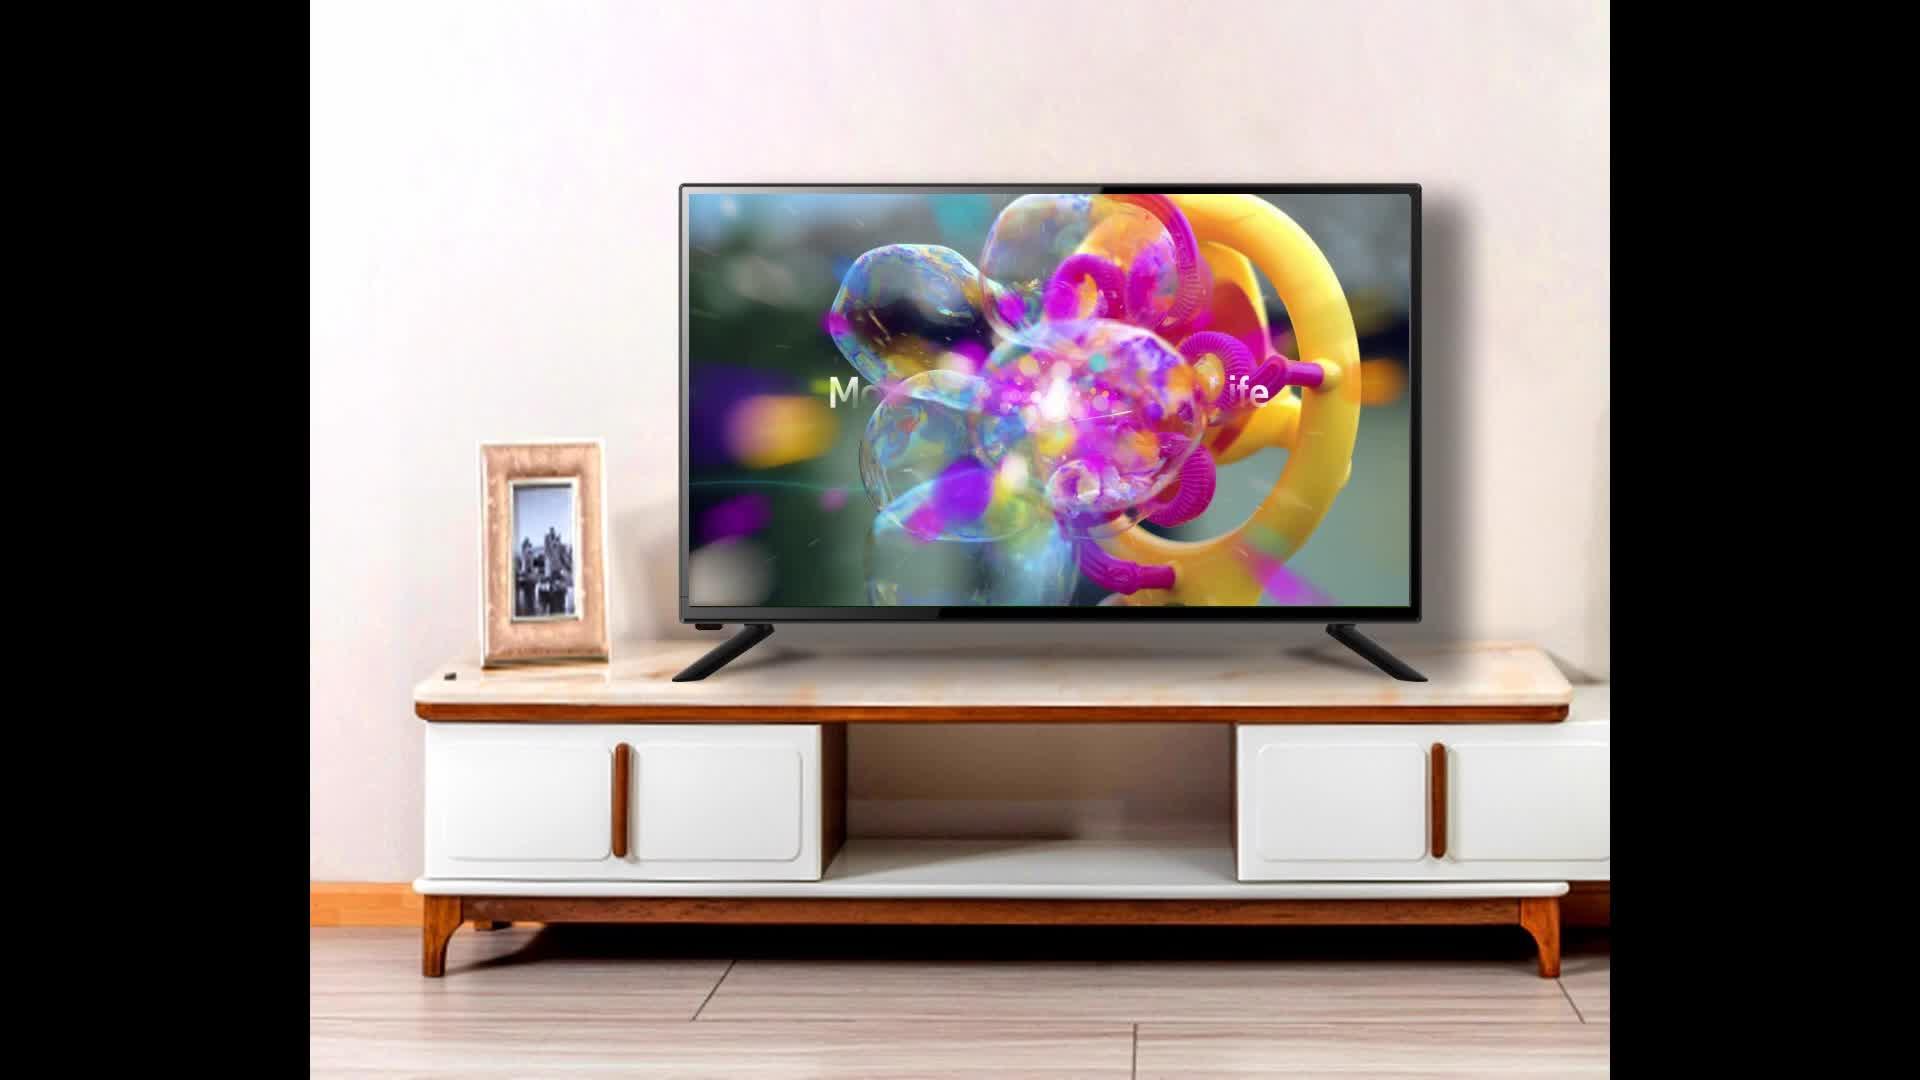 Haina 2020 cheapest full hd 1080p 55inch 4k smart tv television